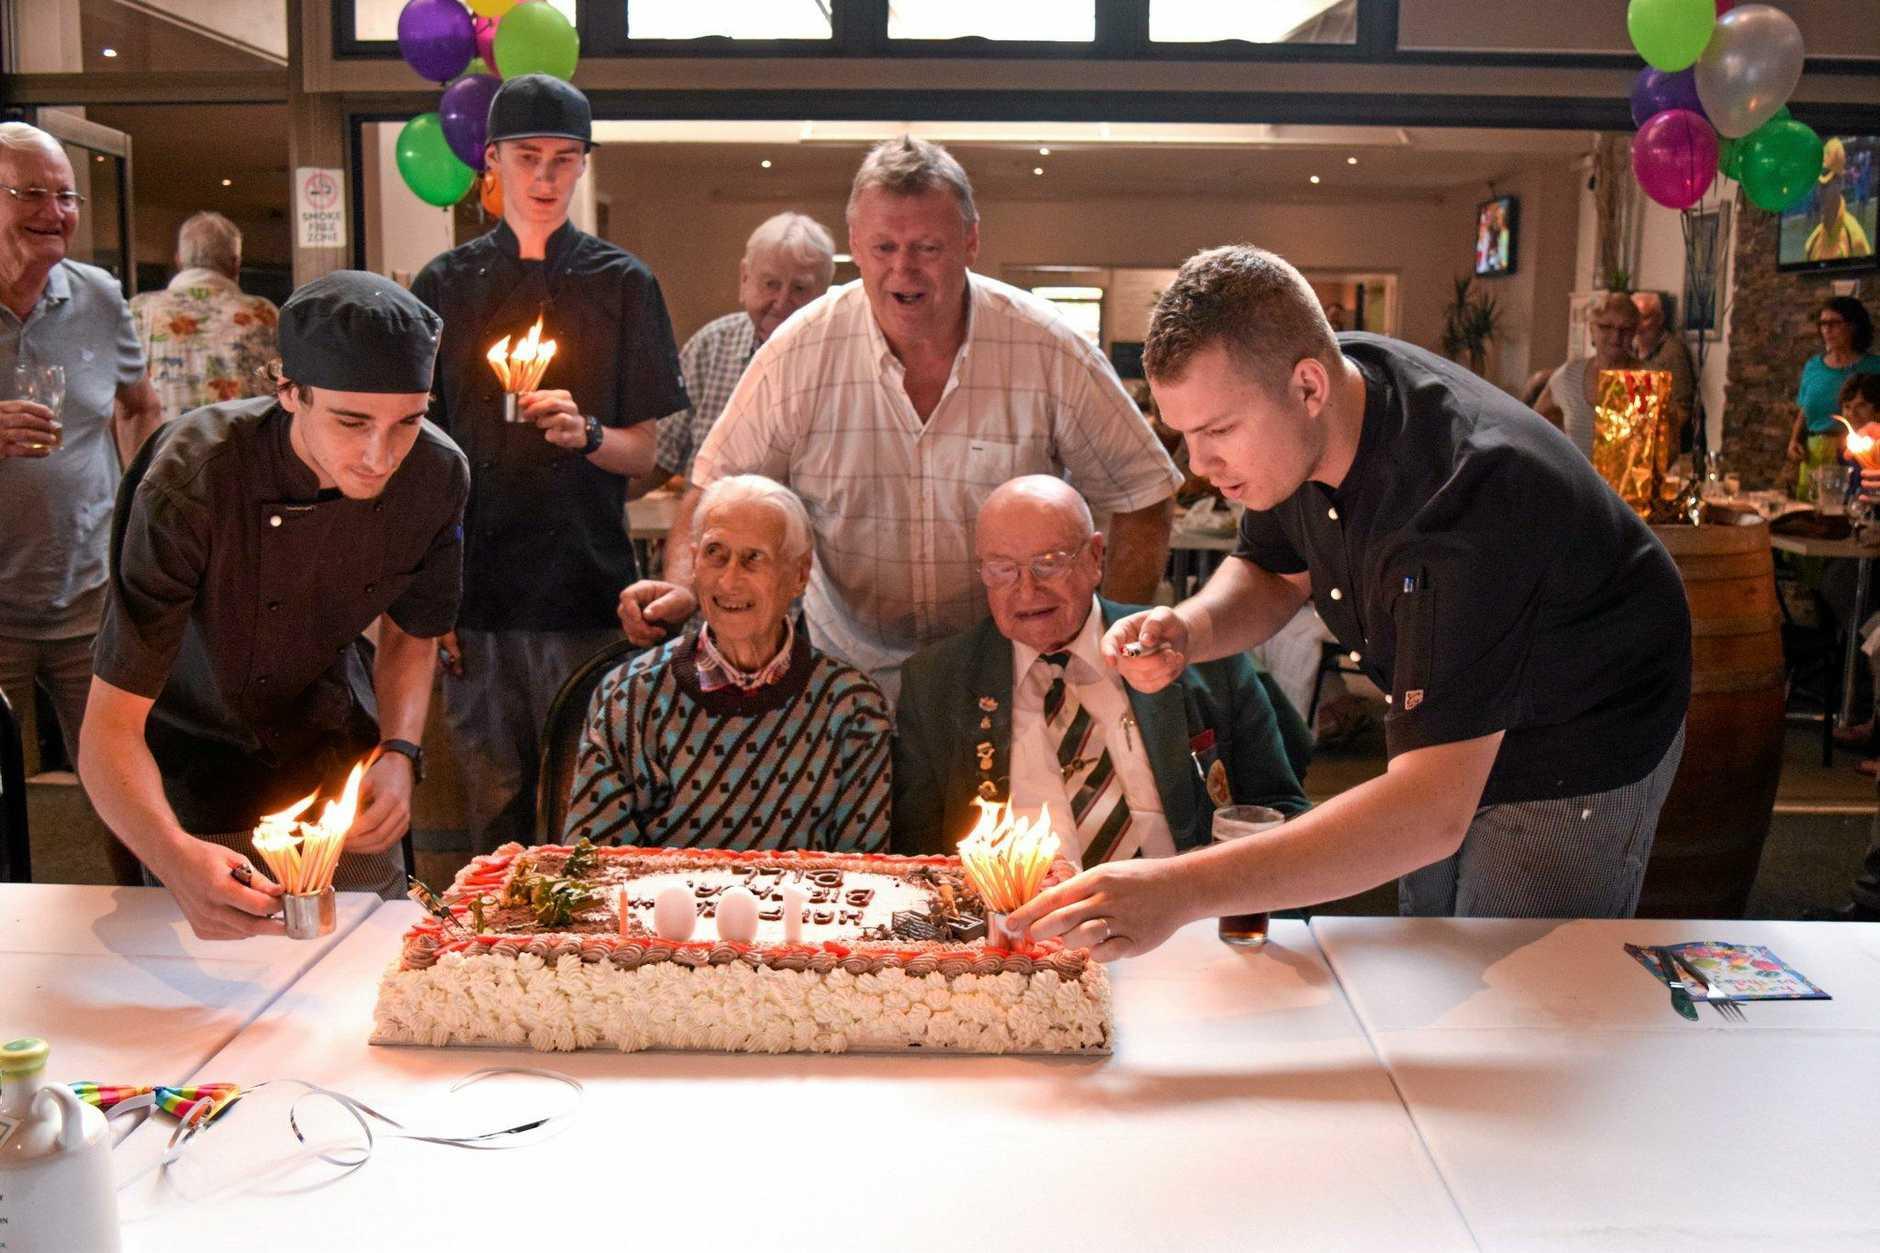 BIG BASH: Coffs Hotel chefs putting the candles on birthday boy, Bill Owers' birthday cake.